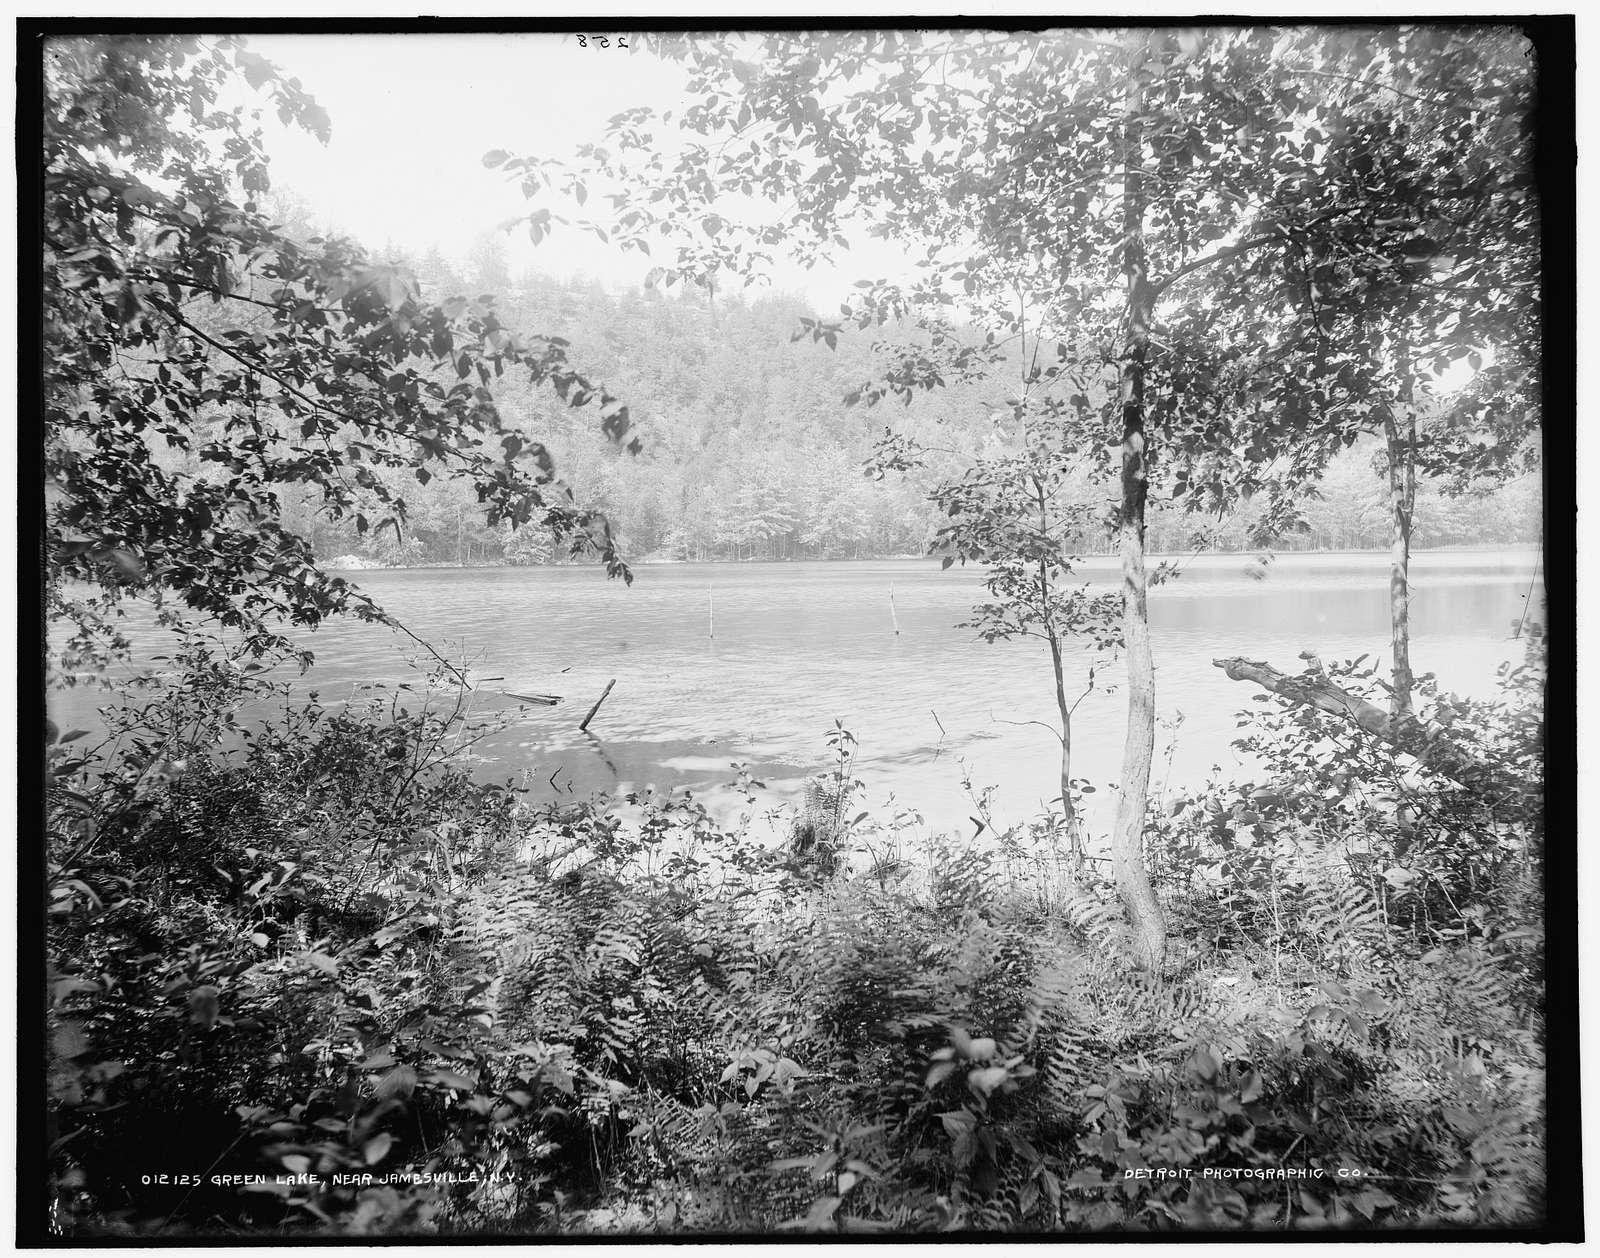 Green Lake near Jamesville, N.Y